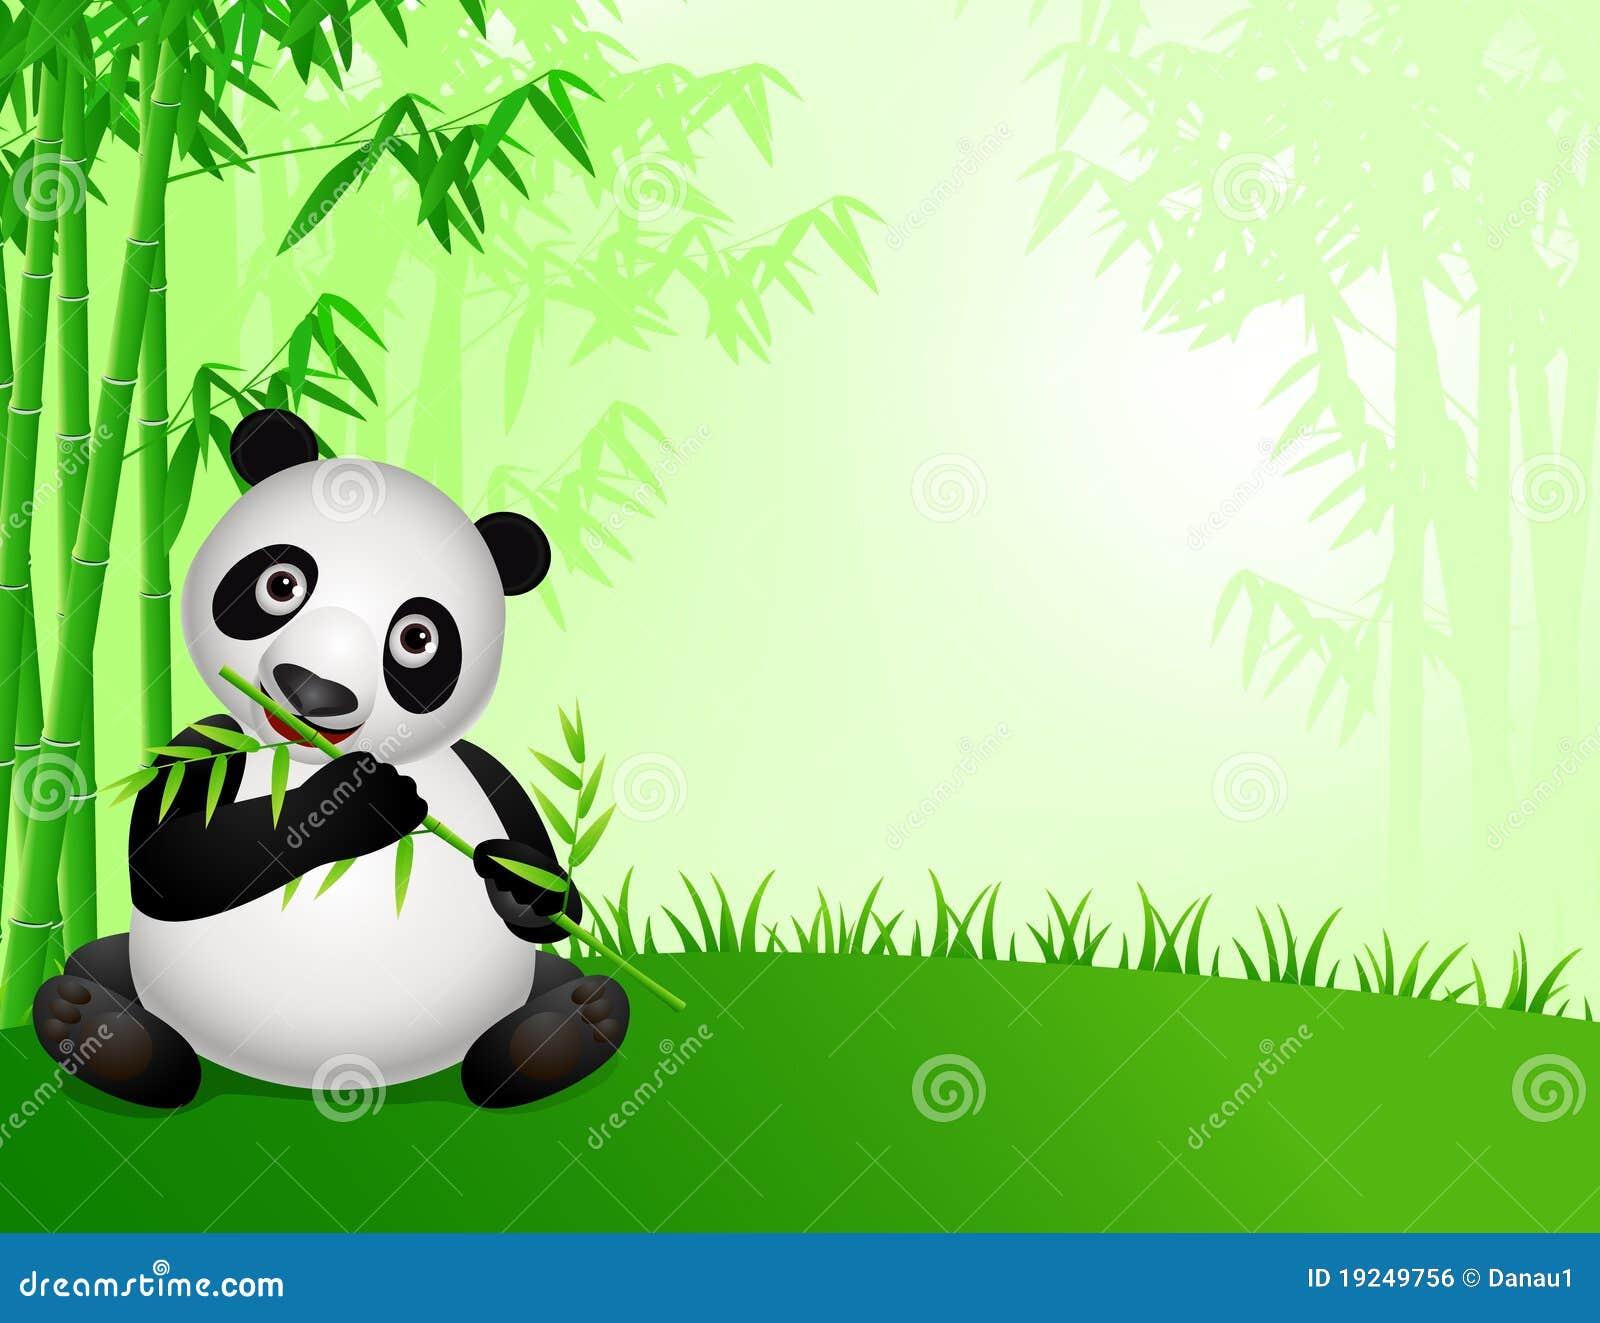 Dessin anim mignon de panda dans la nature image libre de - Dessin de nature ...